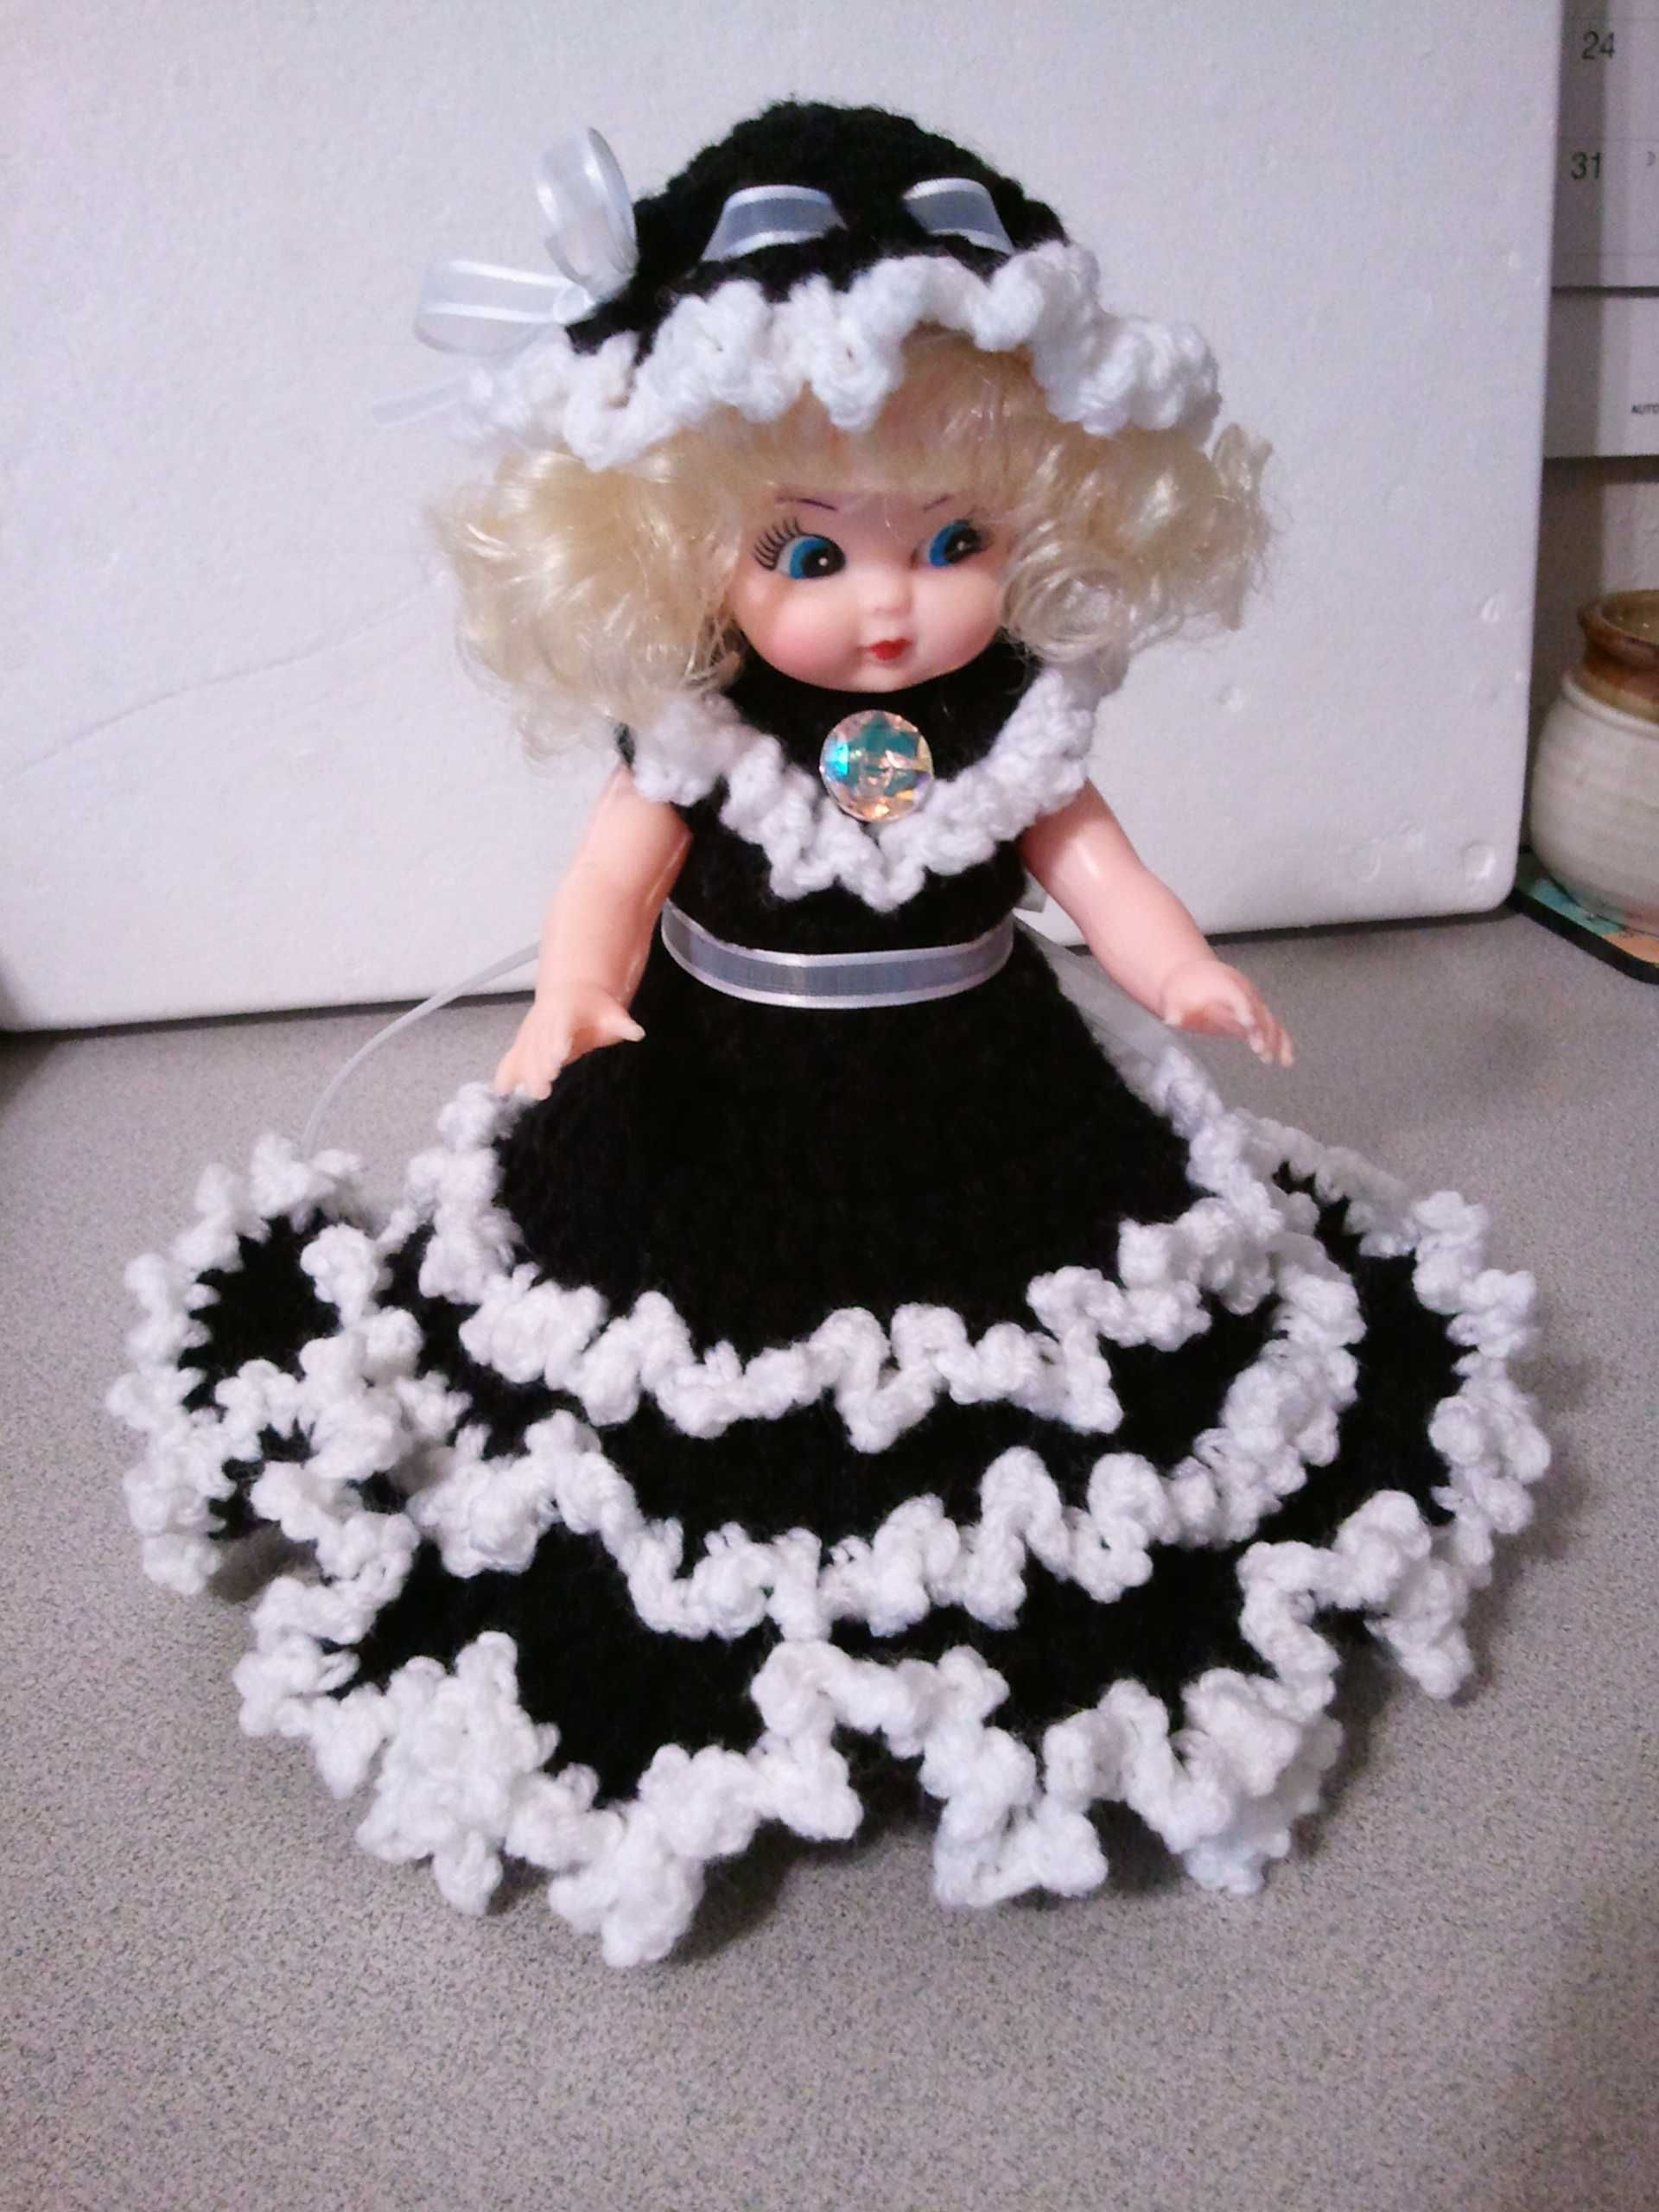 Air Freshener Dolls to Crochet Renuzit Air Freshener